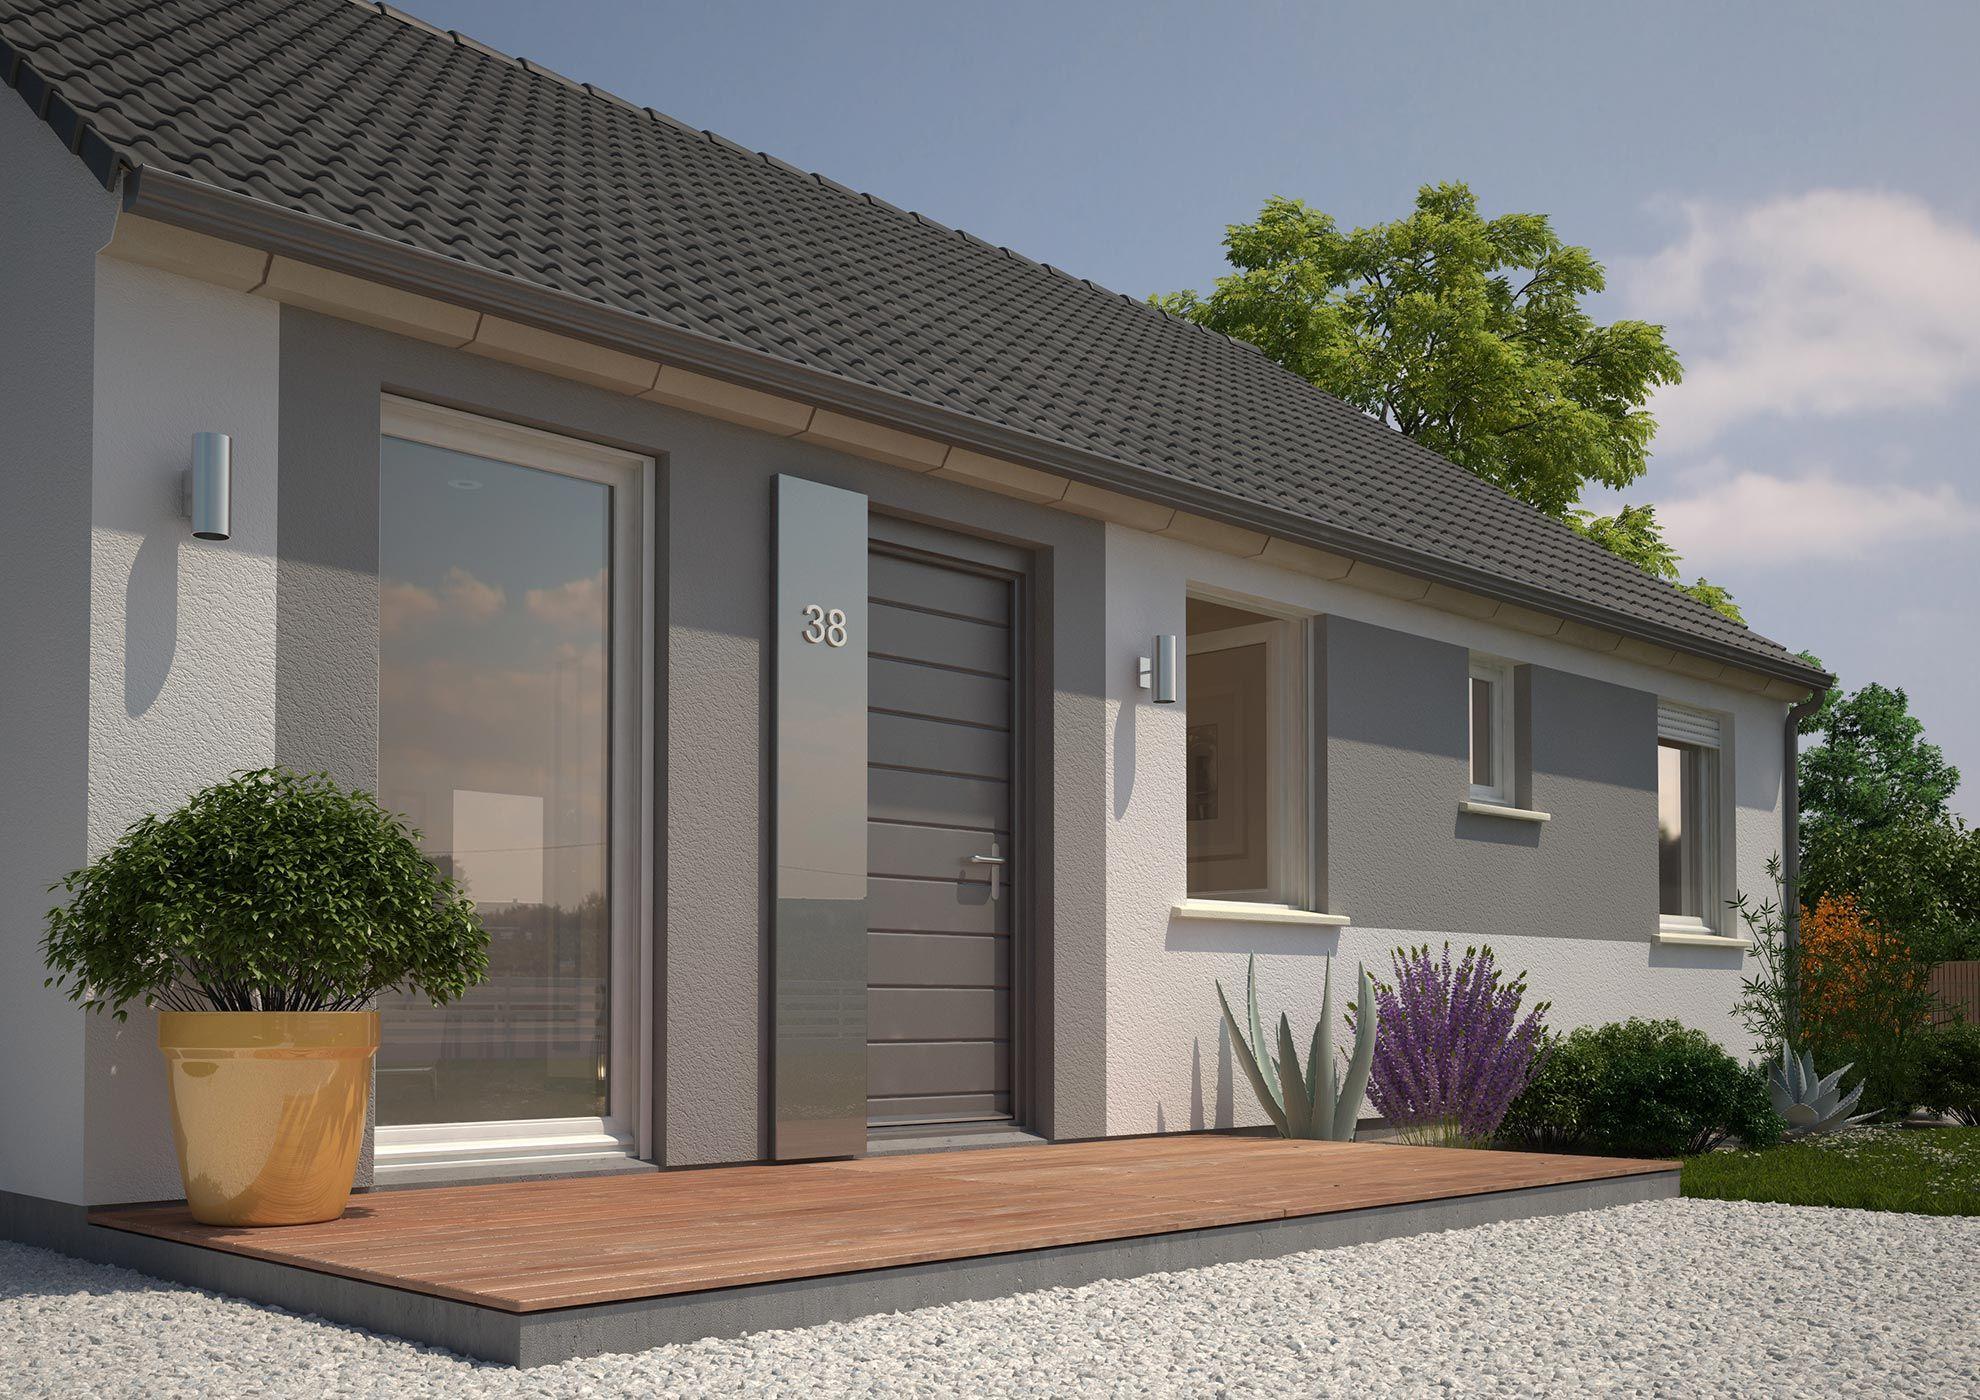 The 25 best crepis facade ideas on pinterest façade maison moderne maisons modernes and architecture de façade